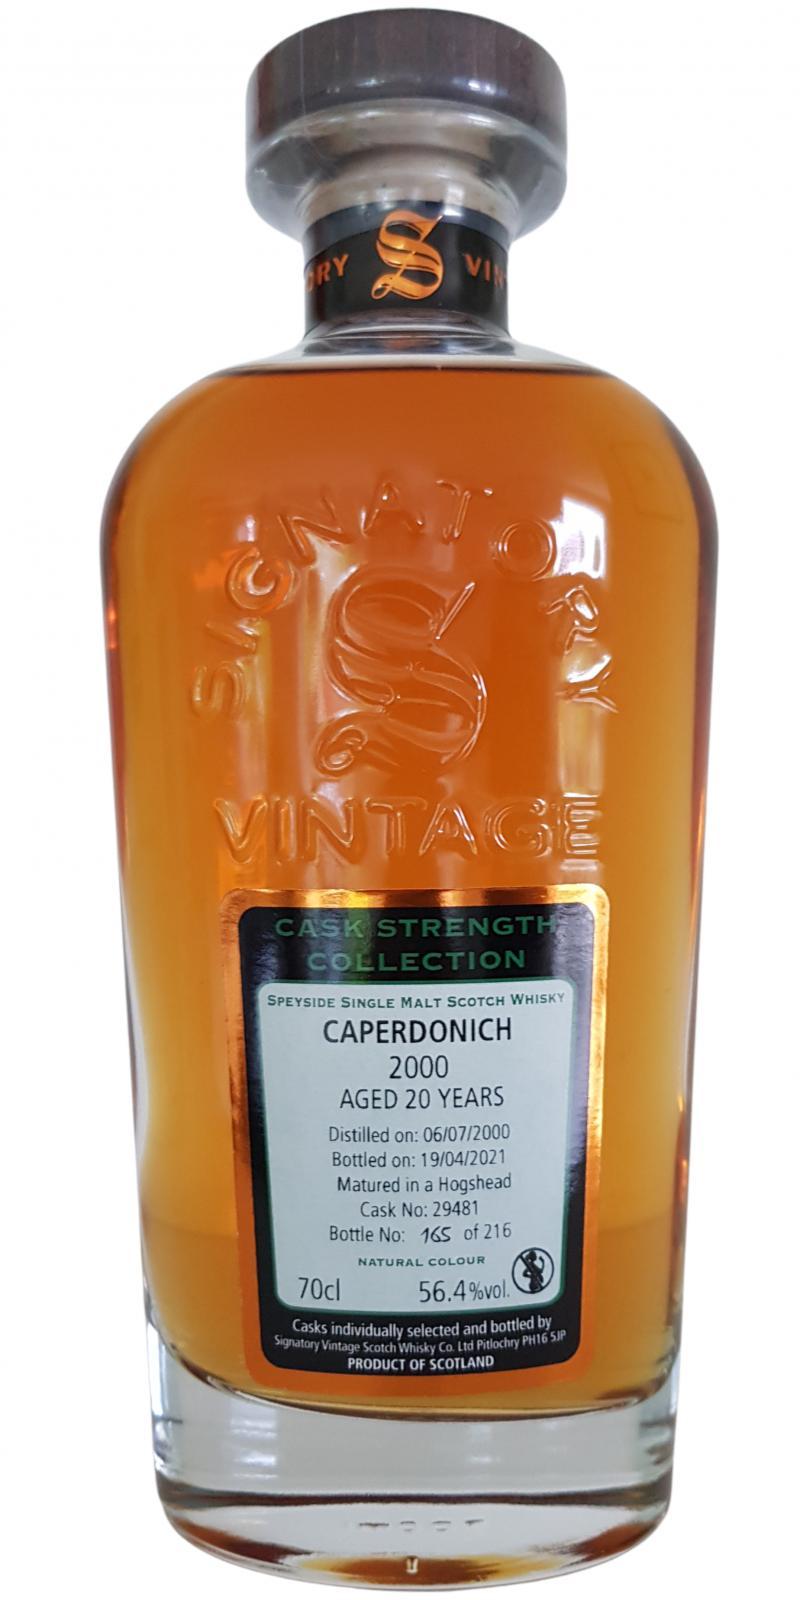 Caperdonich 2000 SV